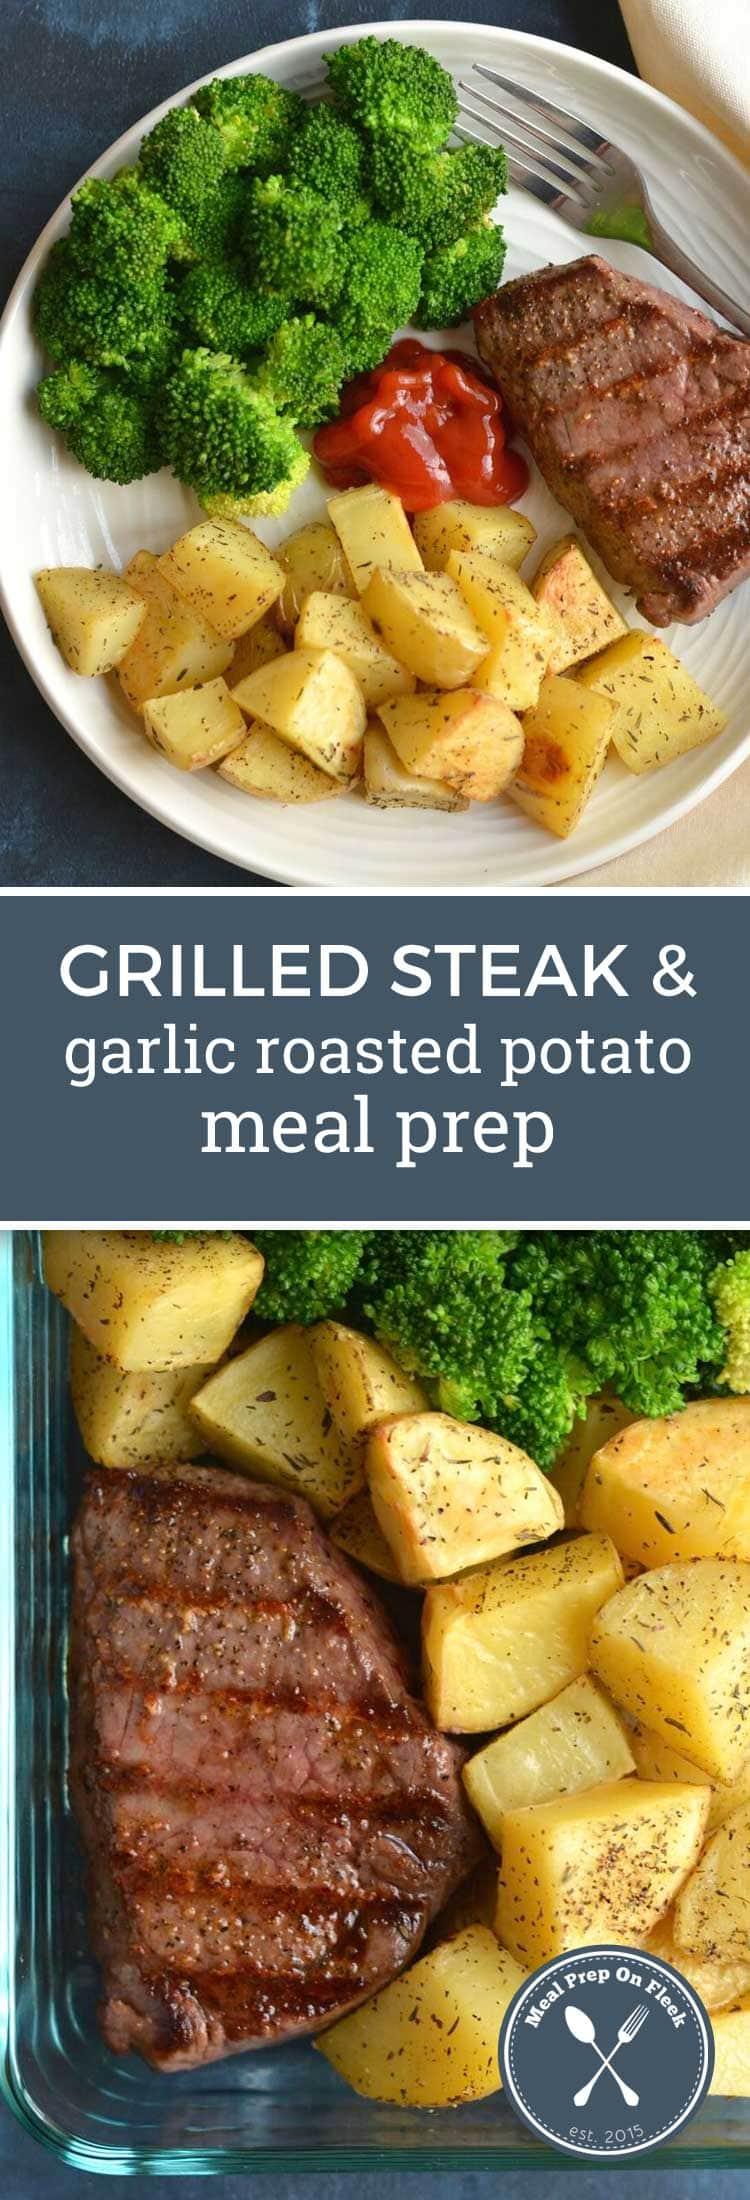 steak and potato meal prep MPOF